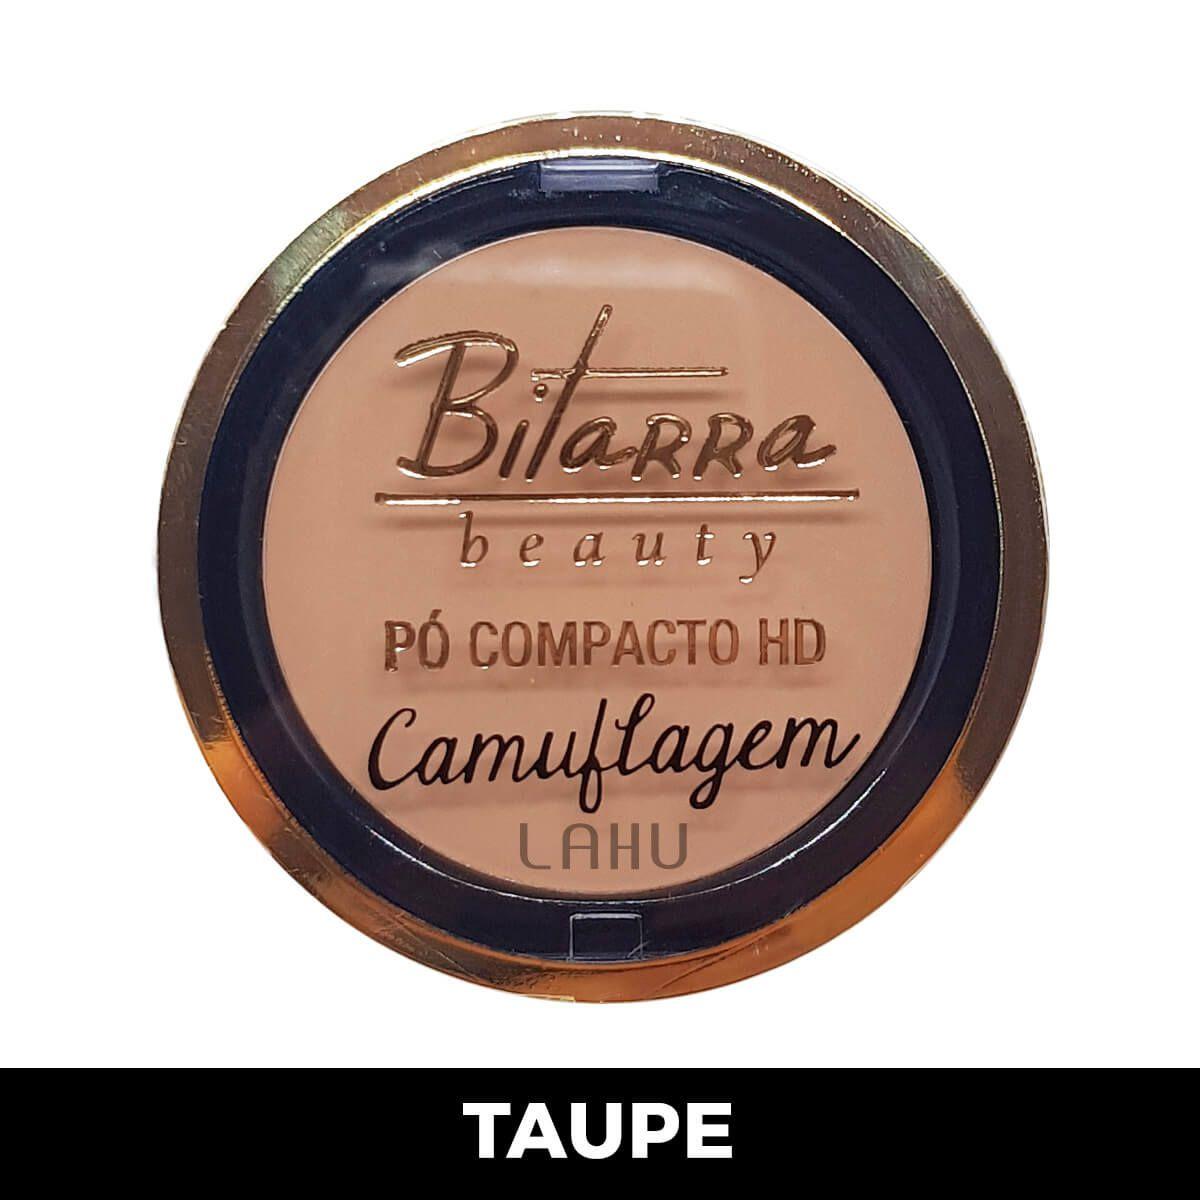 Pó Compacto HD Camuflagem Bitarra - Taupe